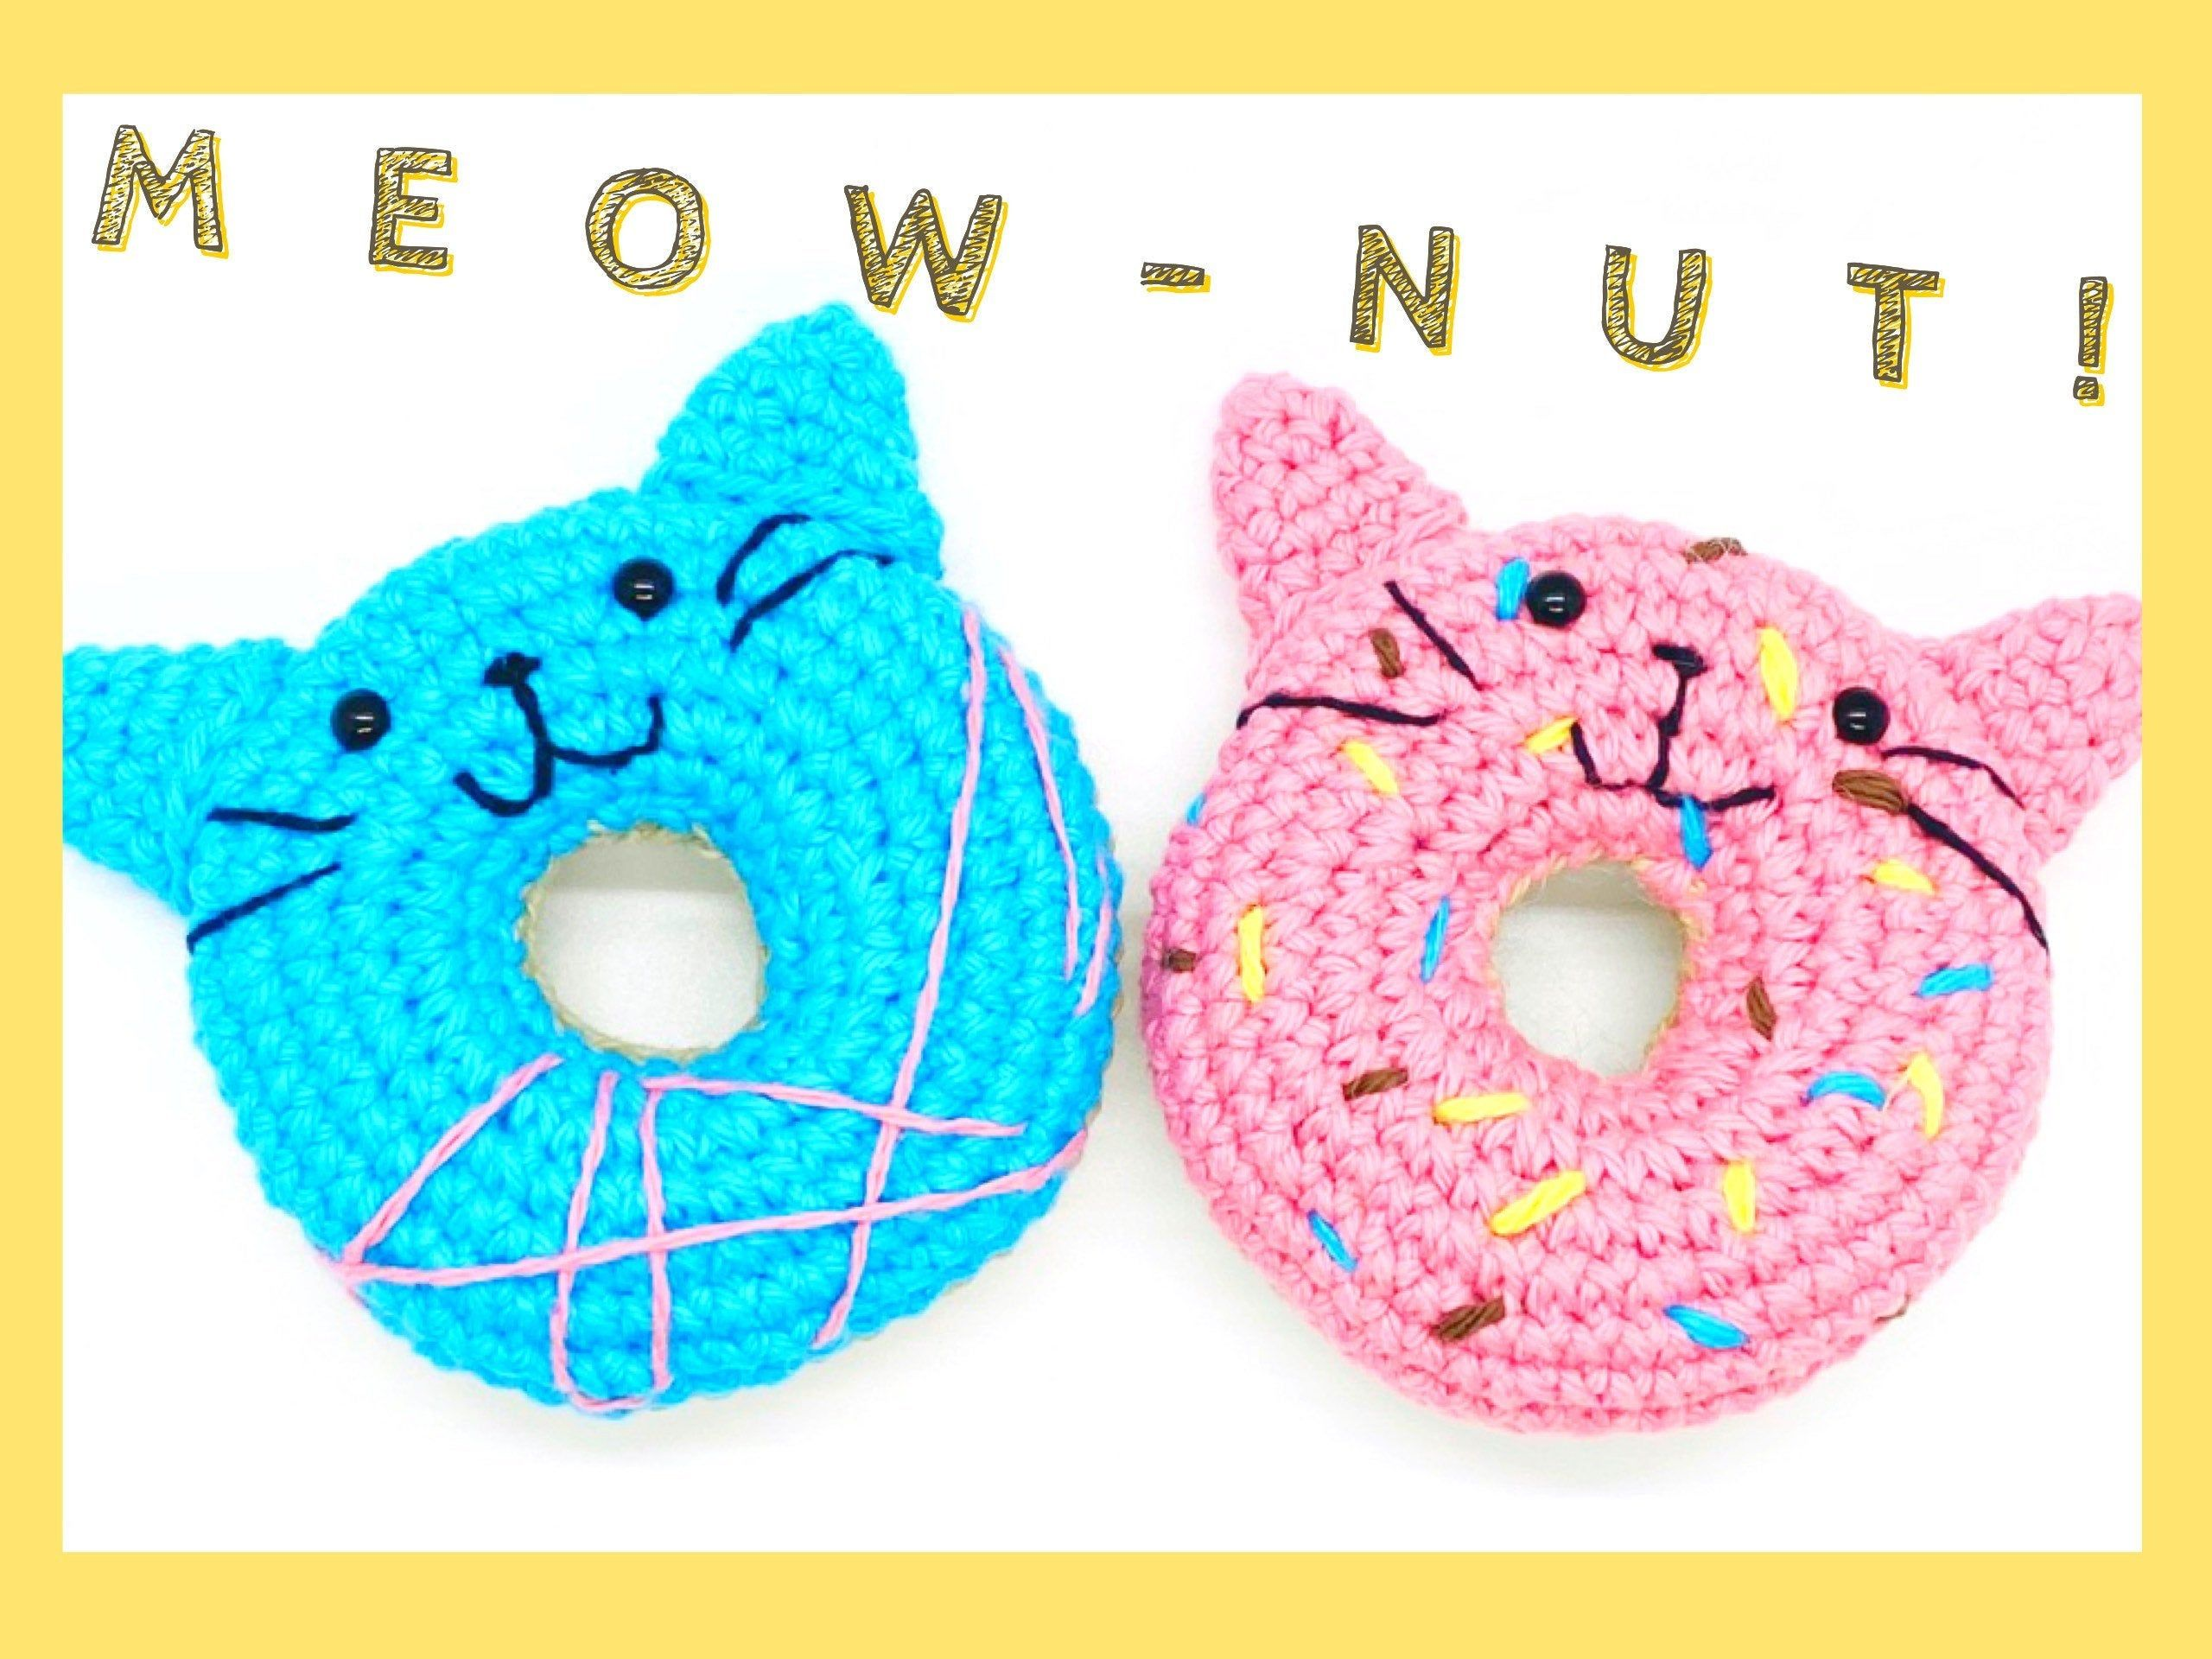 Crochet Cat Pattern PDF Cat Plushie Amigurumi Crochet Toy Donut Cute AmigurumiCrochet Kitty PatternHandmade gift for cat lovers!